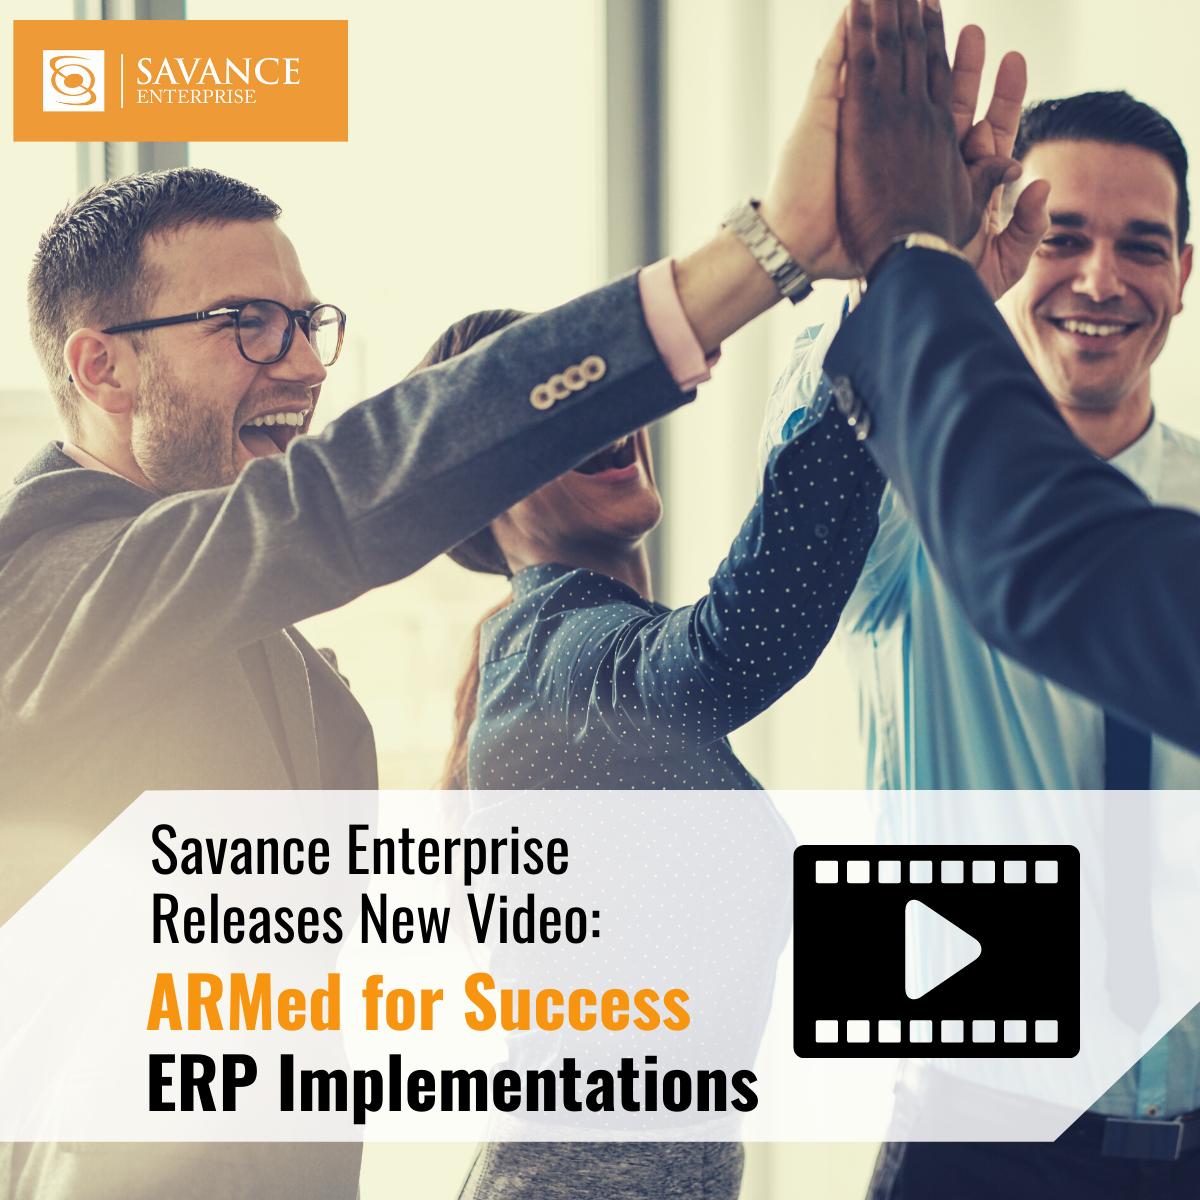 savance-eneterprise-armed-for-success-video-release-1200x1200